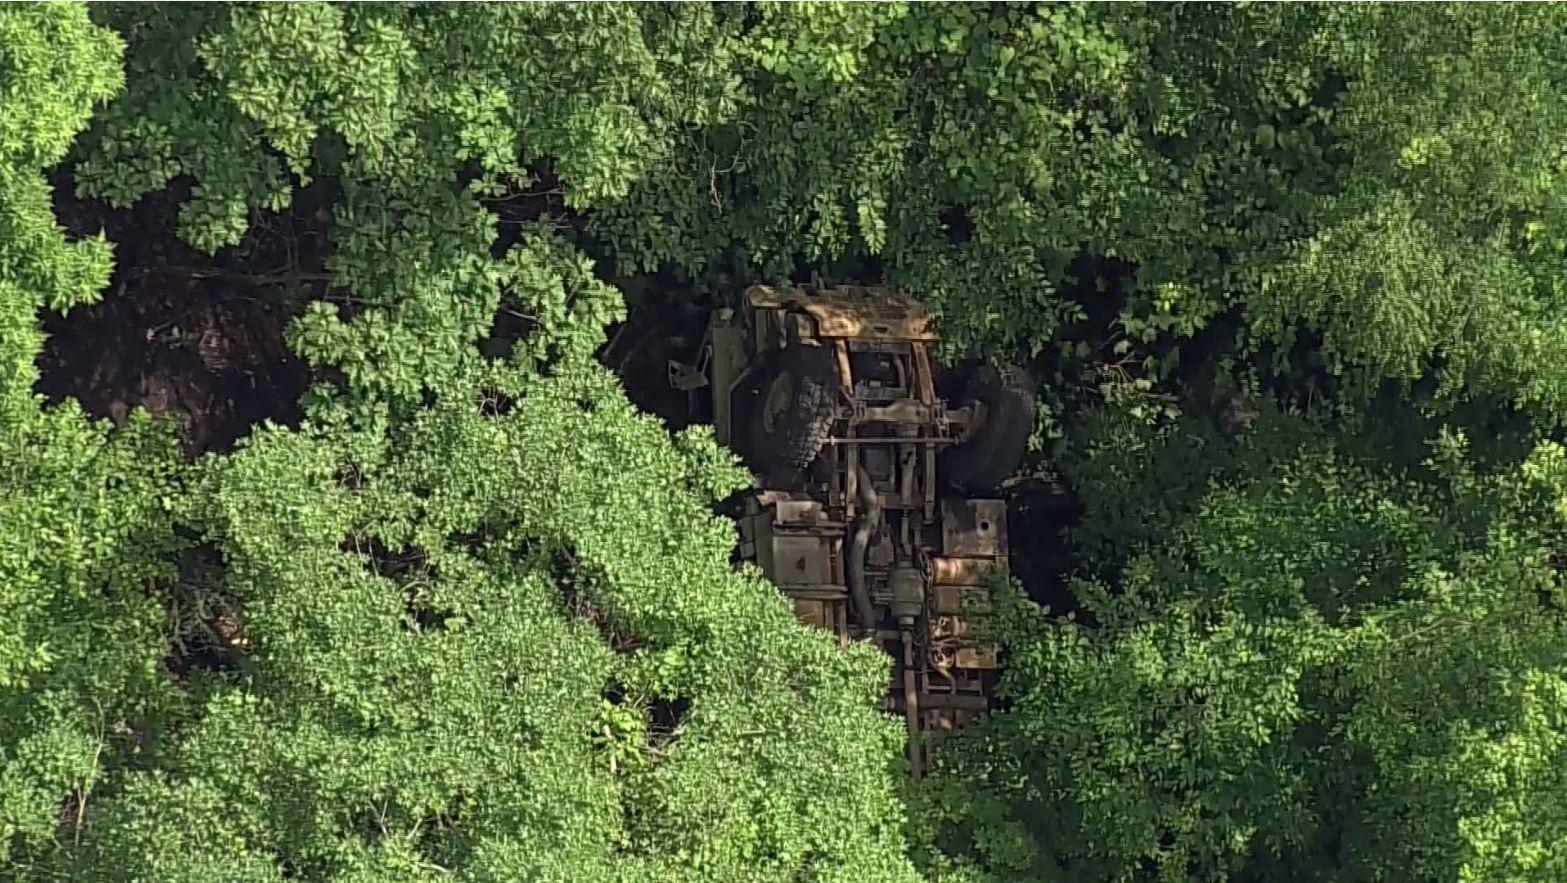 deadly West Point crash_1559836920822.JPG.jpg